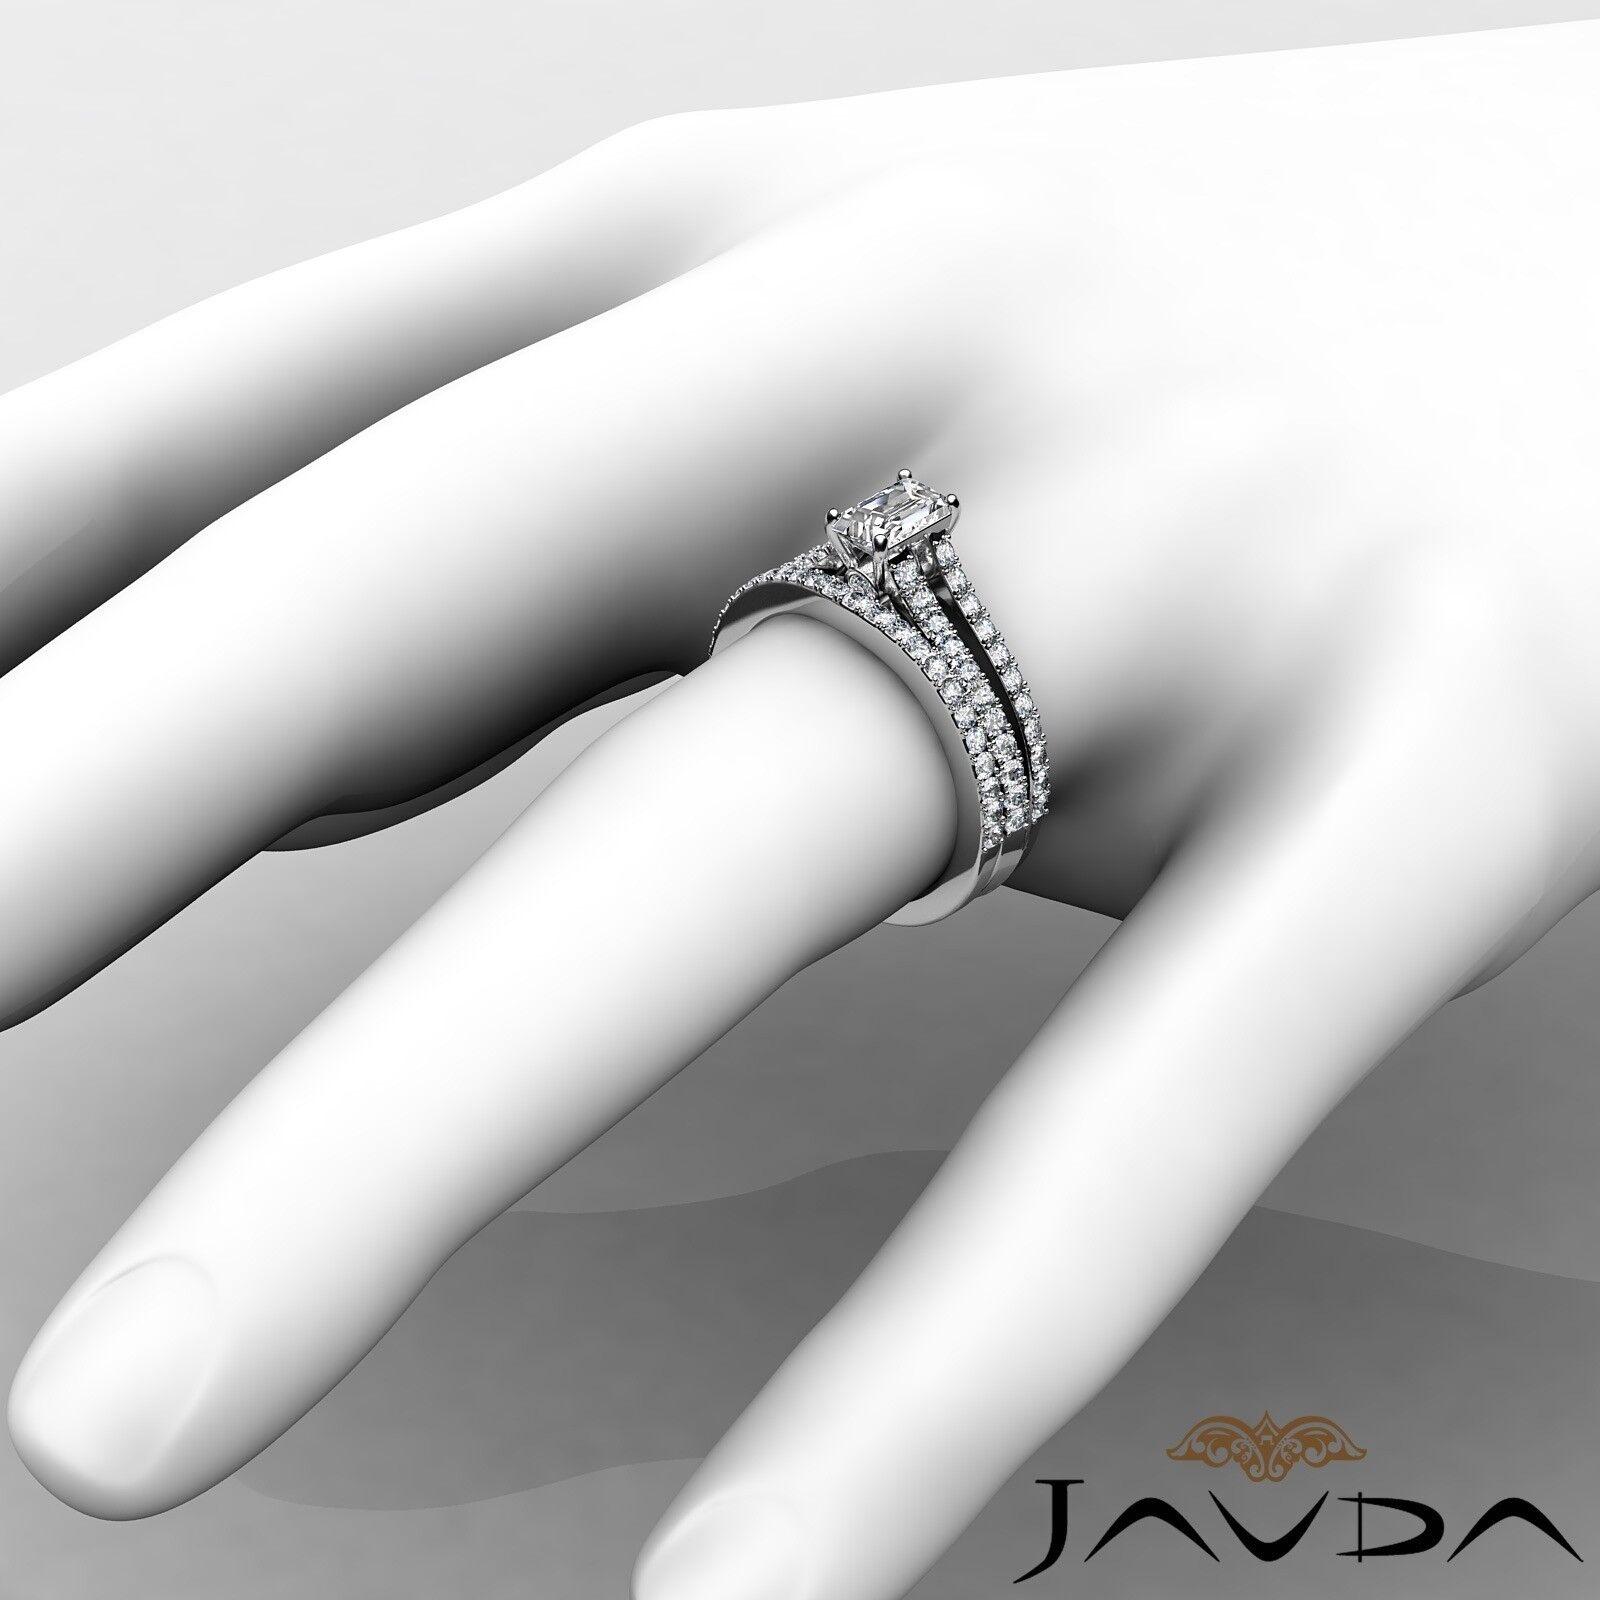 1.51ctw Split Shank Bezel Bridal Set Emerald Diamond Engagement Ring GIA E-VVS1 4